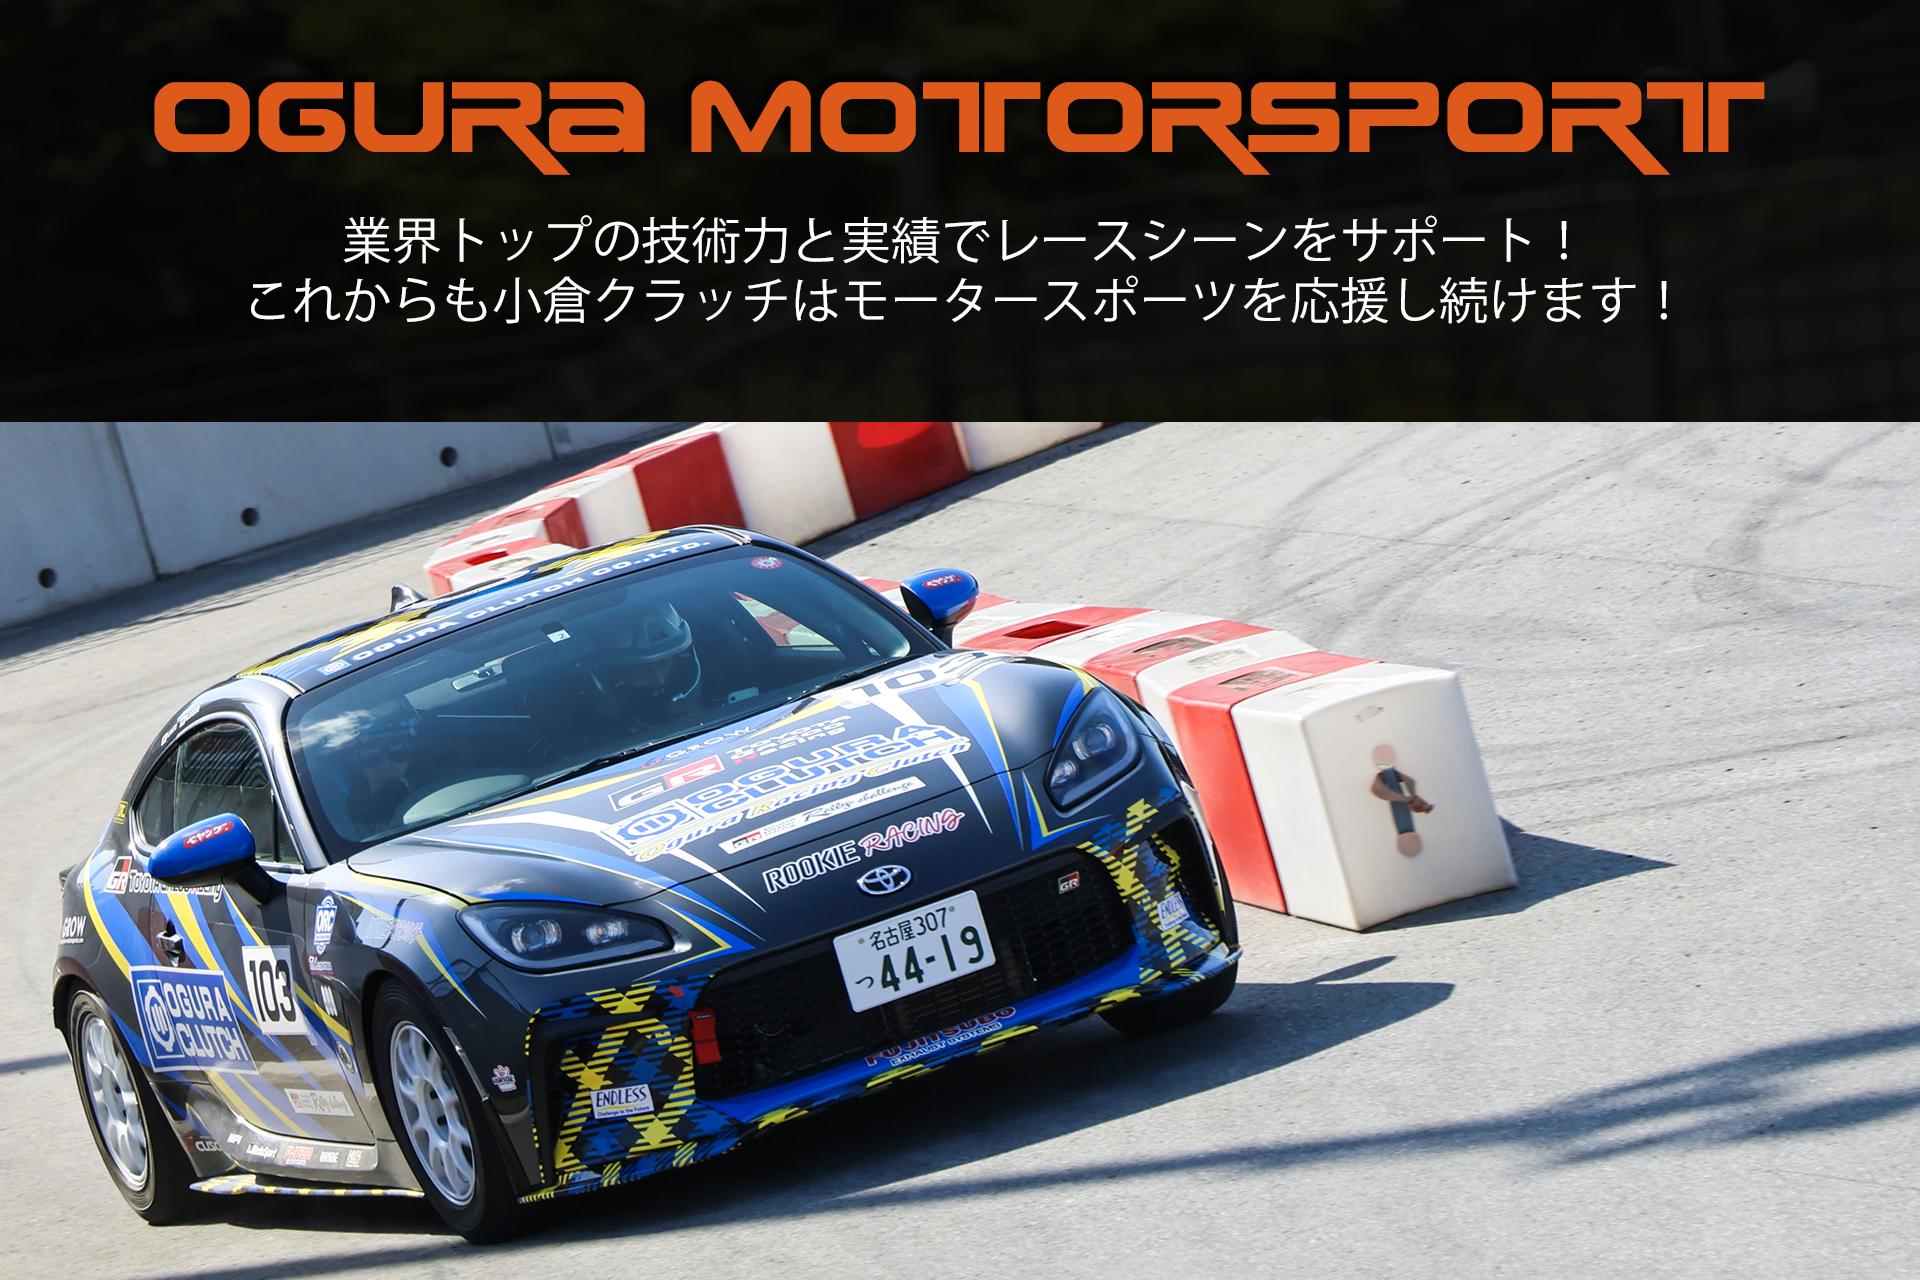 OGURA MOTORSPORT